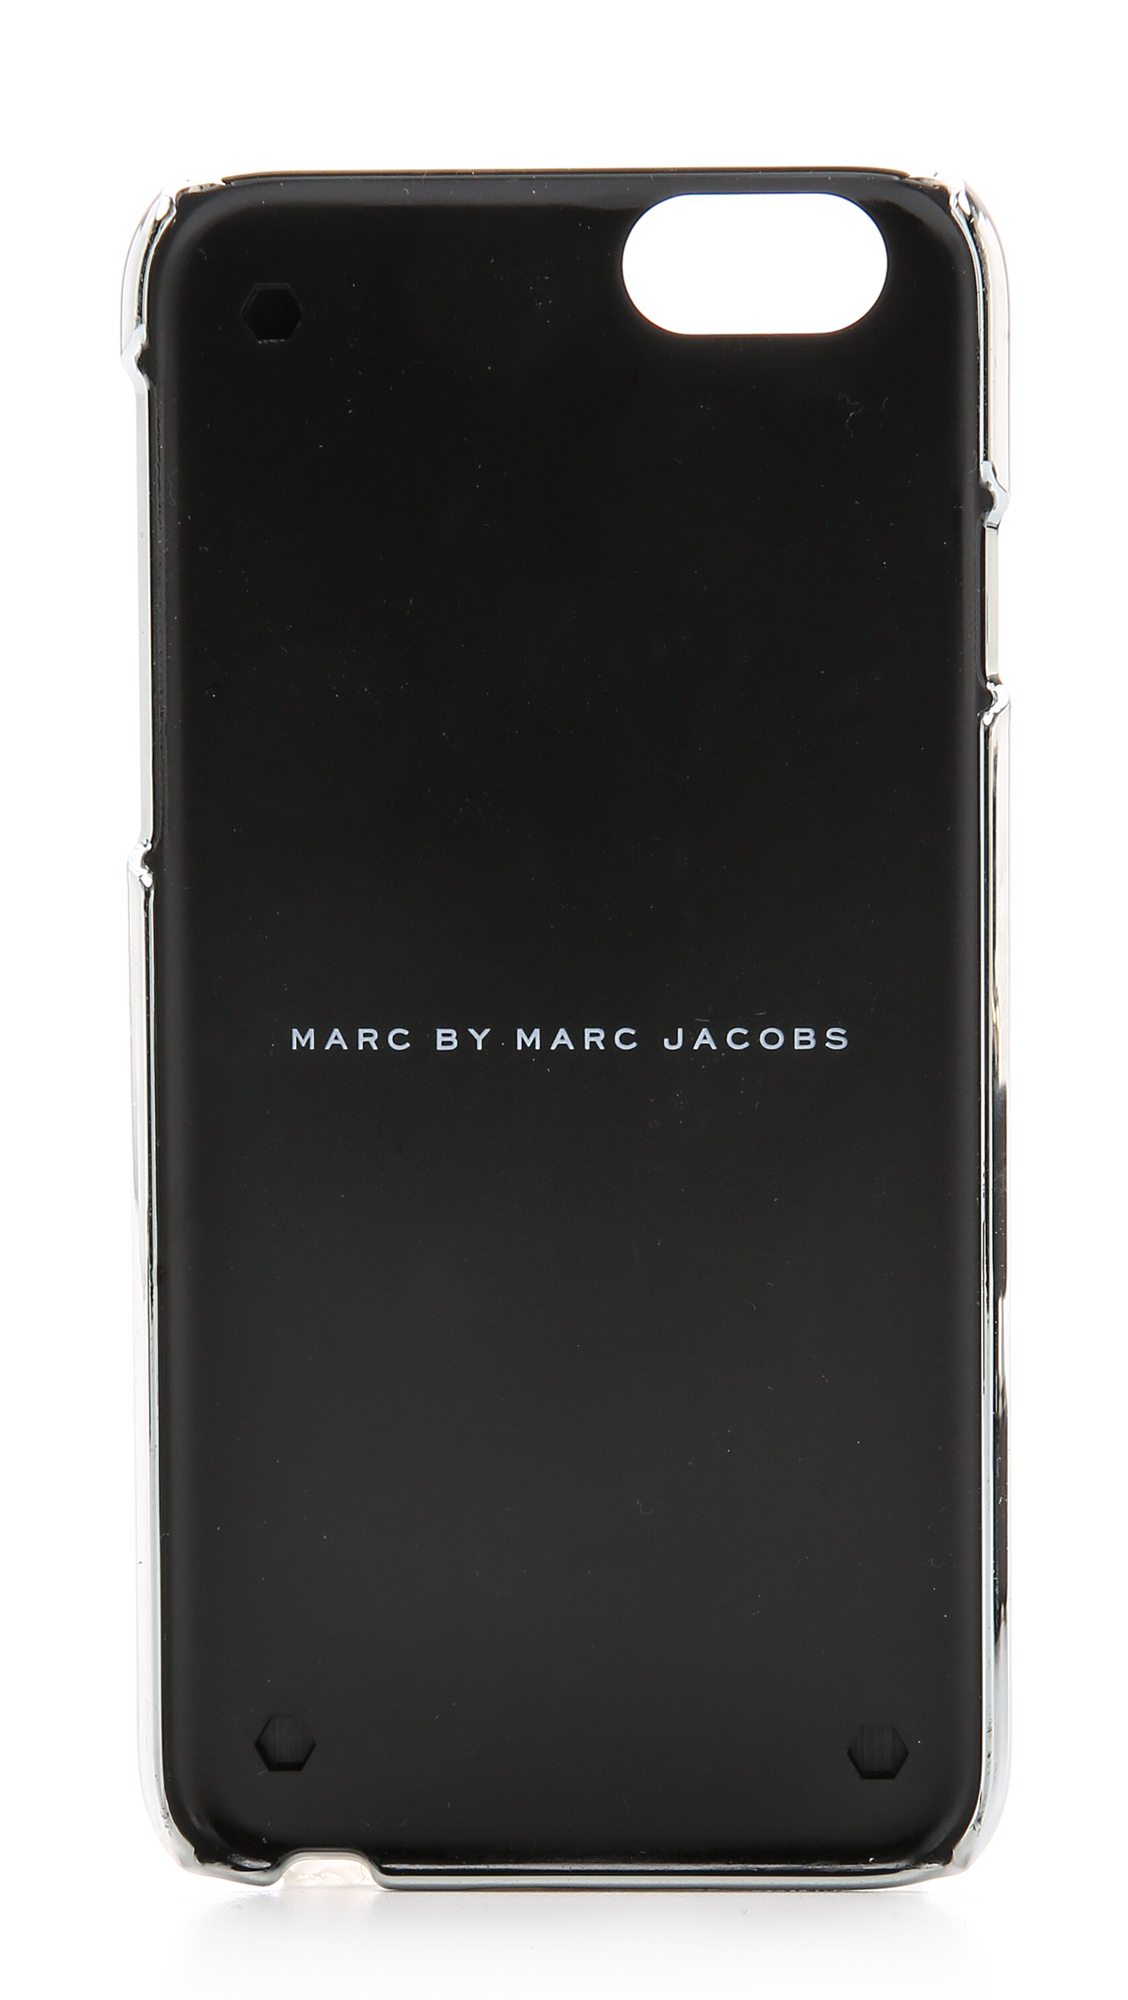 marc by marc jacobs metallic iphone 6 case metallic. Black Bedroom Furniture Sets. Home Design Ideas